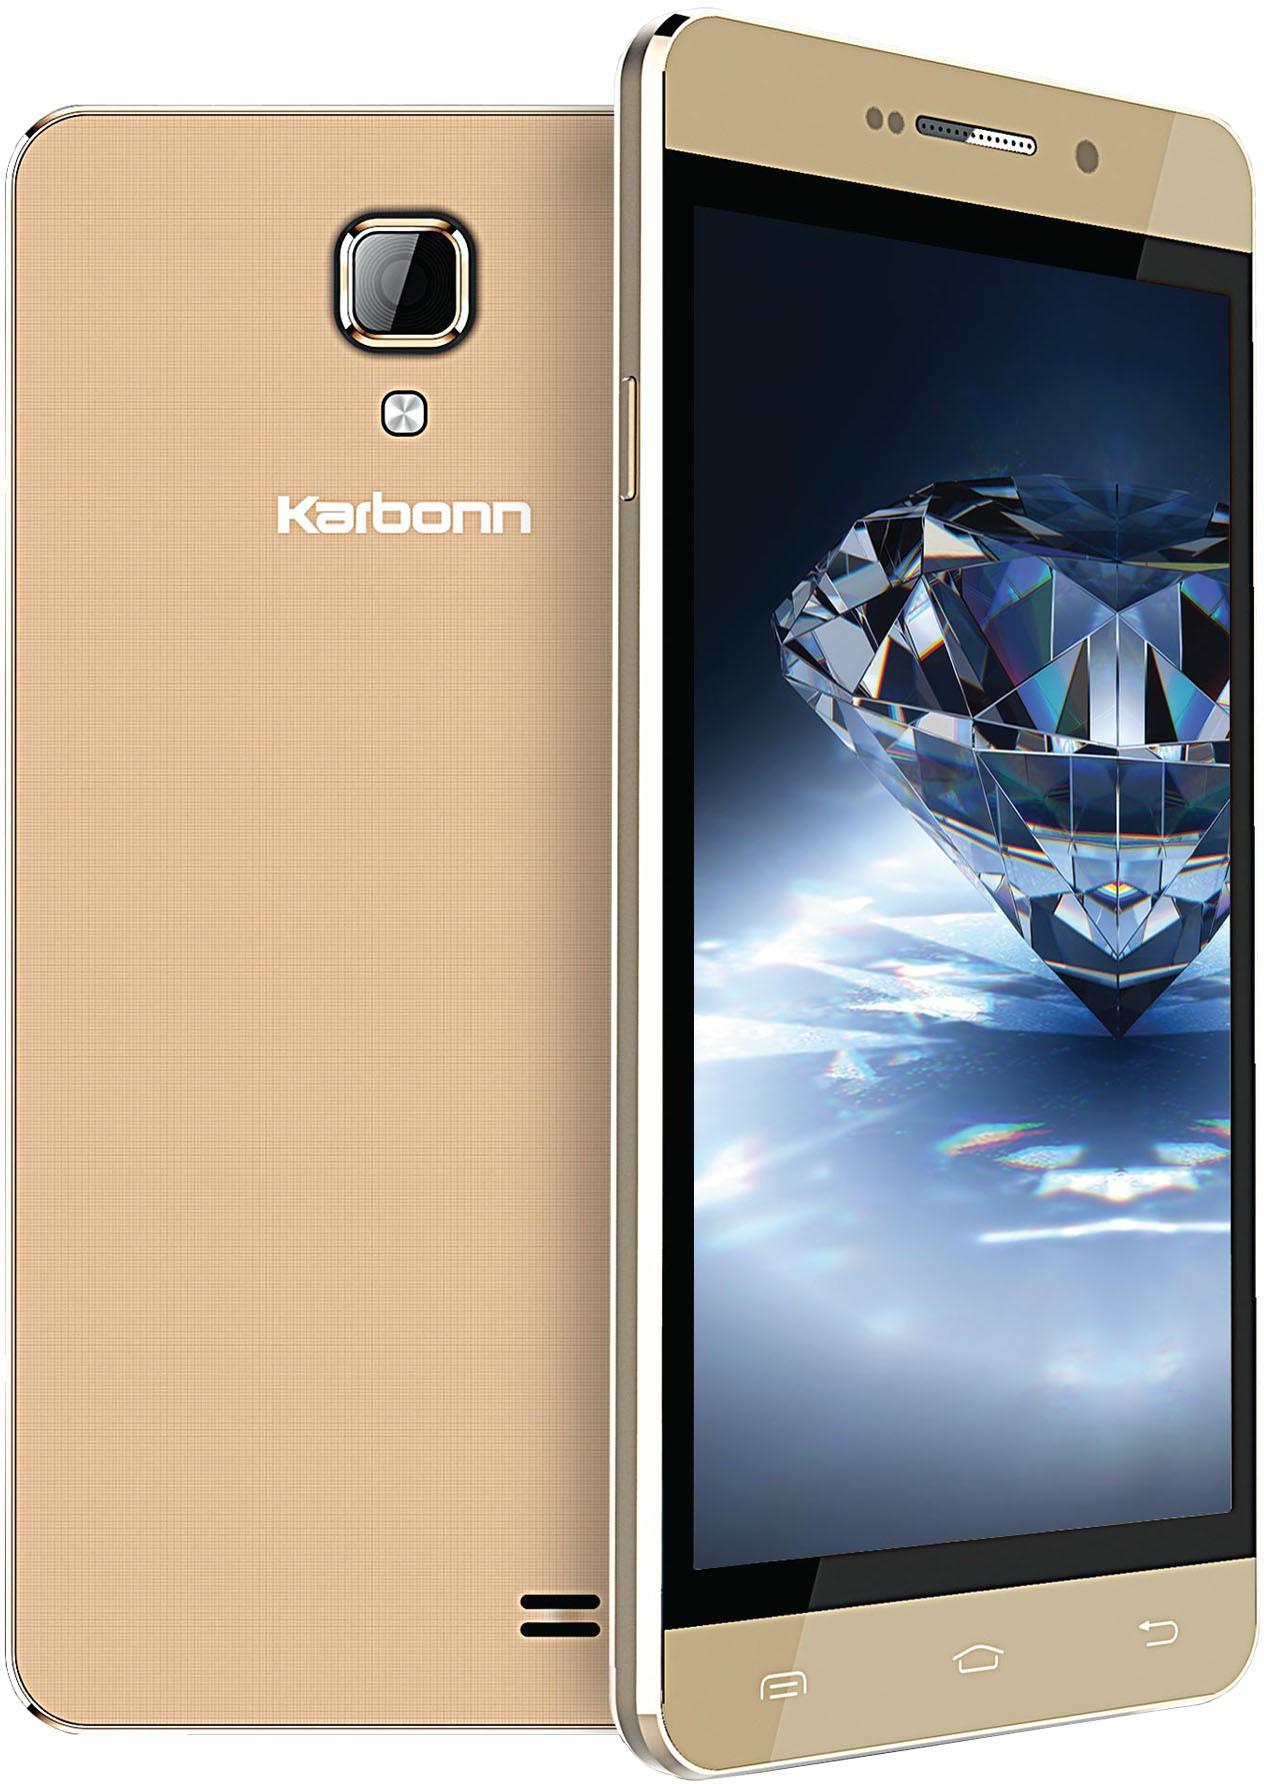 Karbonn Titanium Moghul (1GB RAM, 8GB)